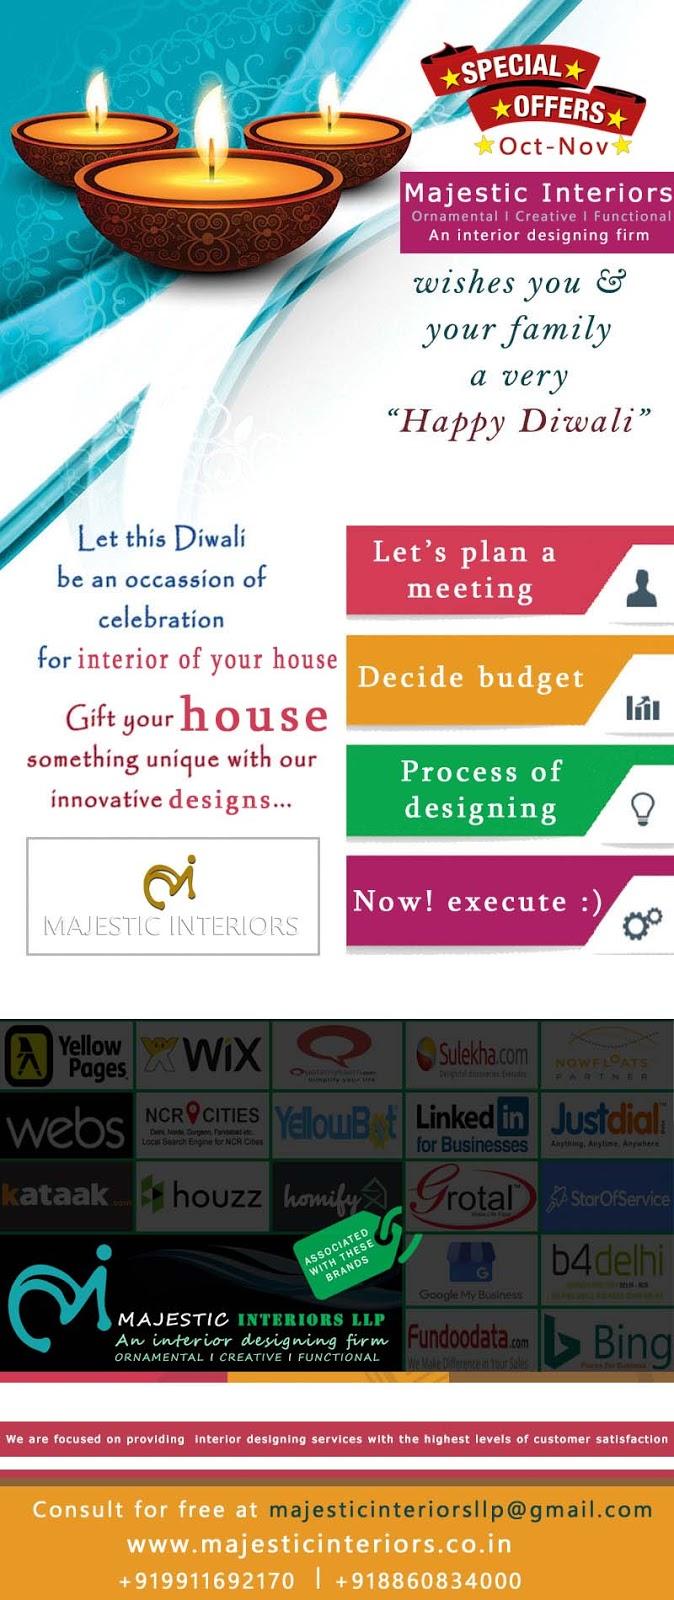 Best-interior-designers-in-faridabad-neharpar-bptp-delhi-NCR